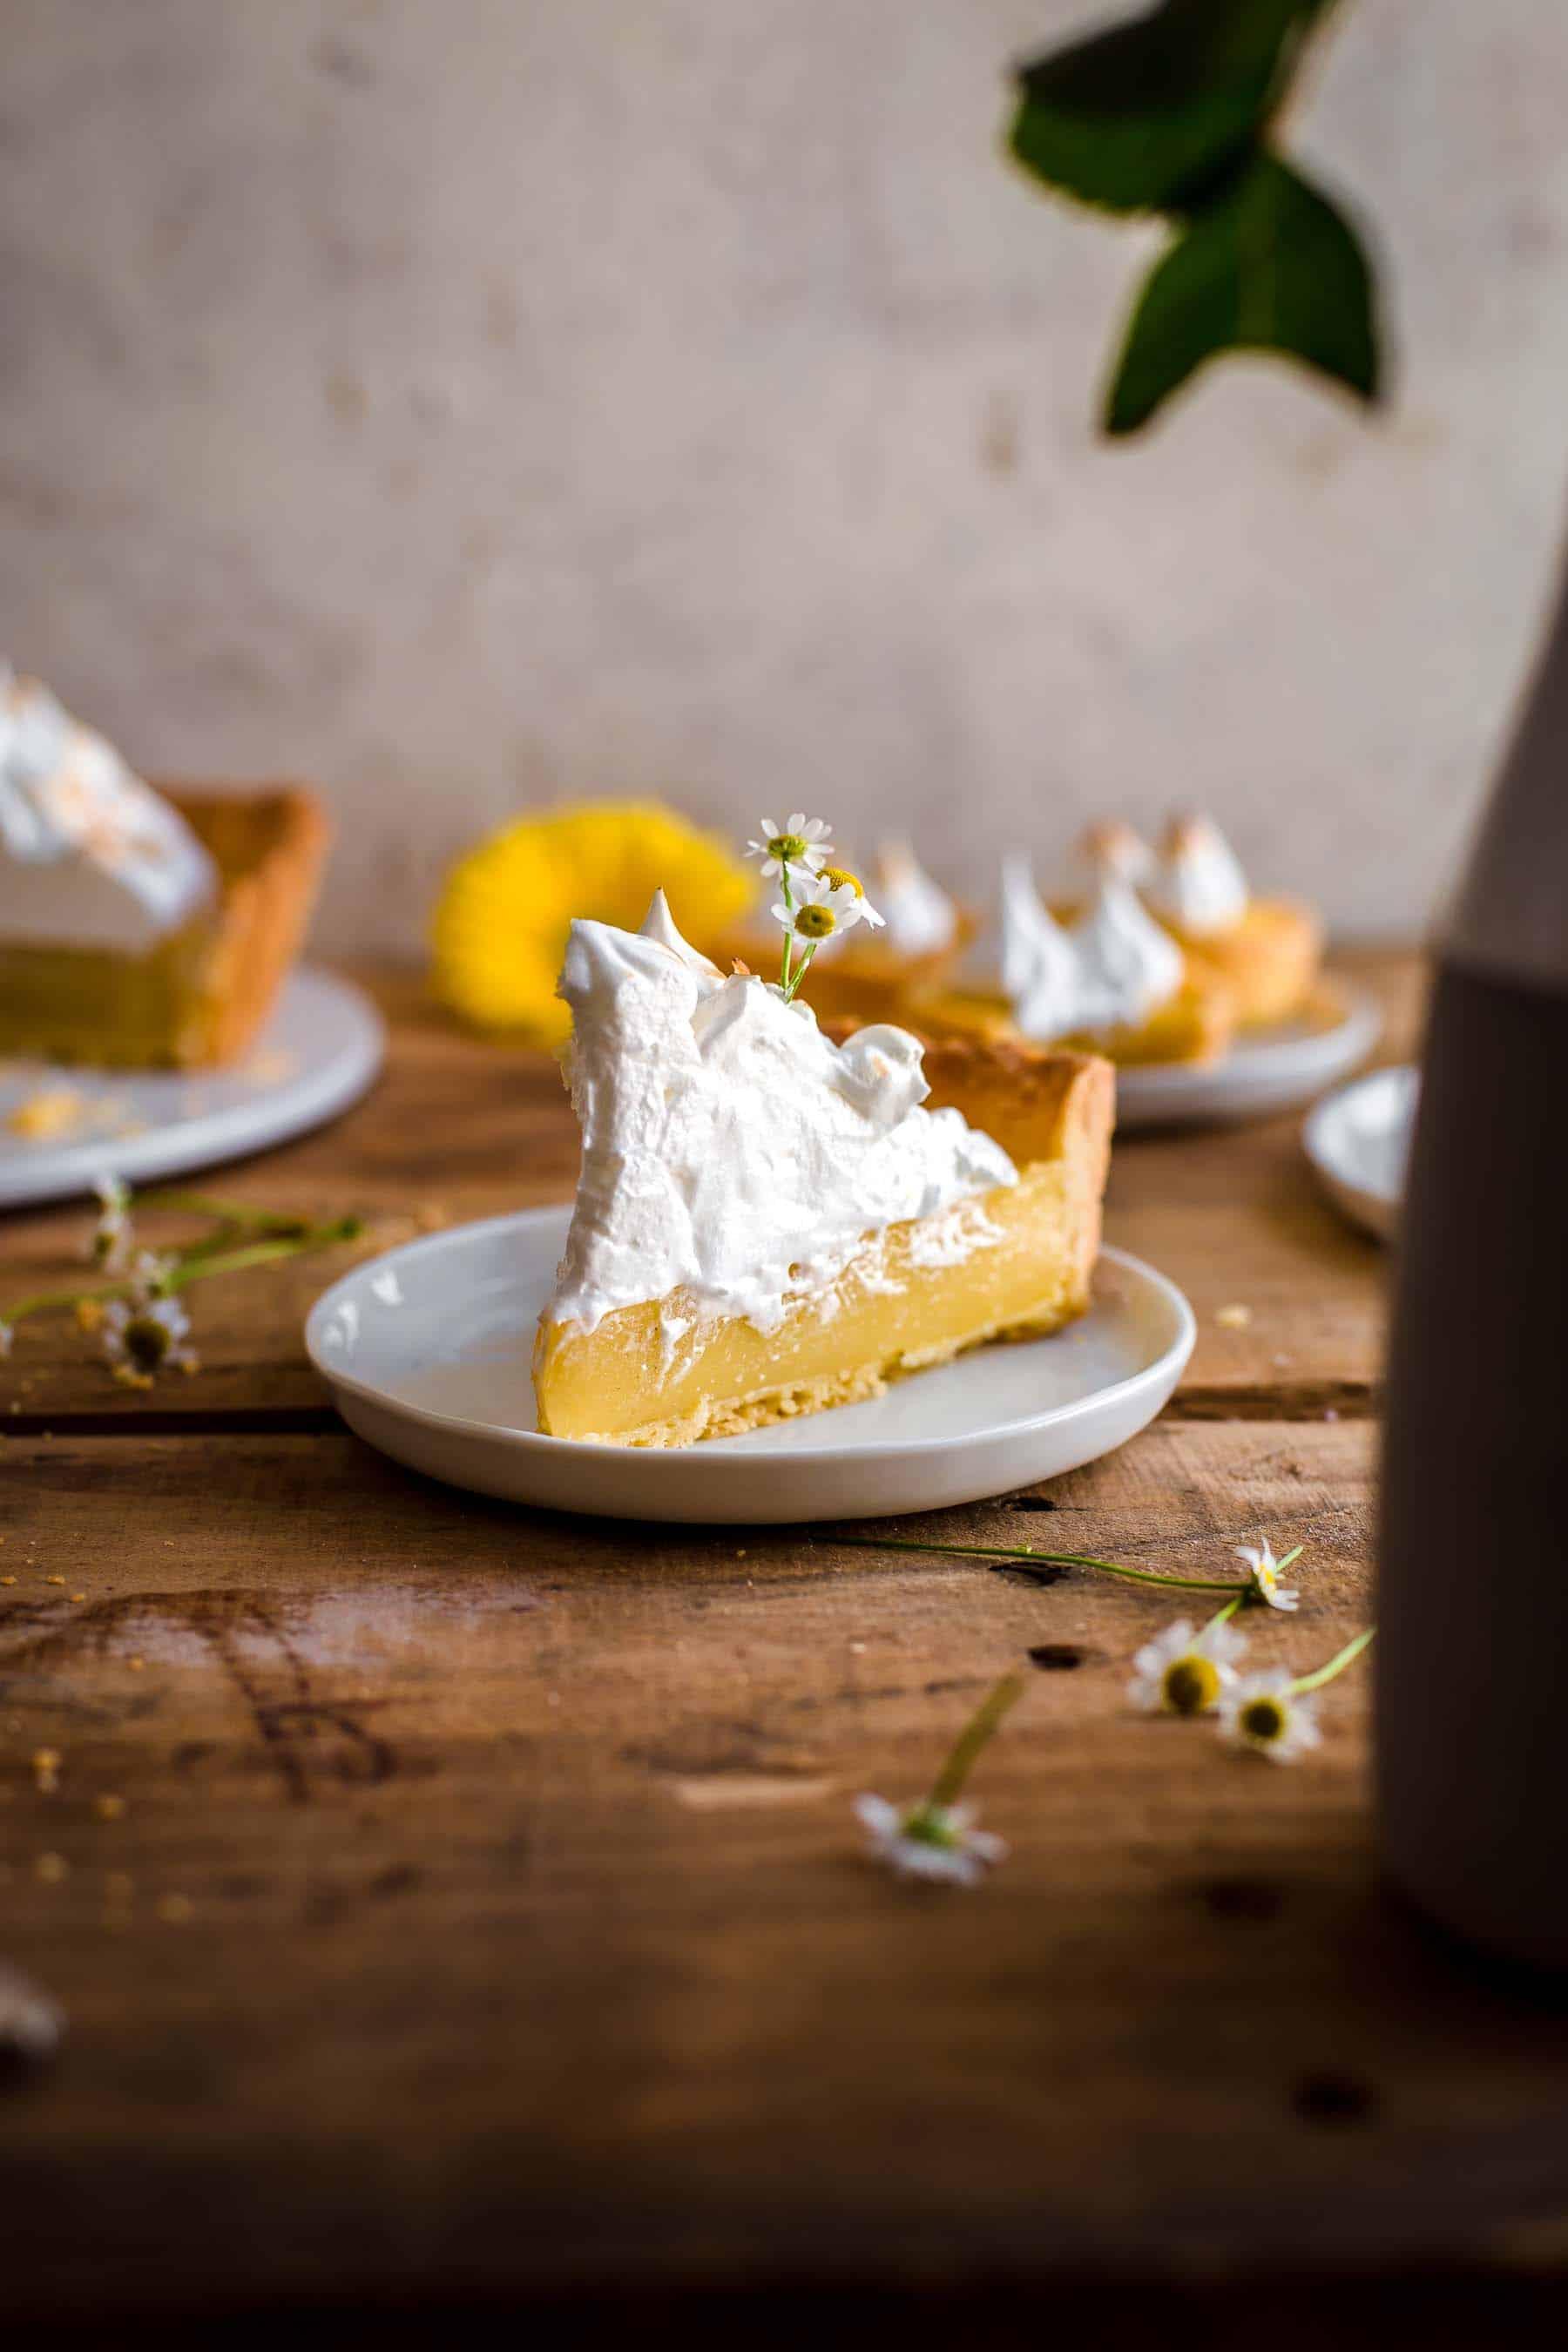 Cut slice of Lemon Meringue Tart on dessert plate